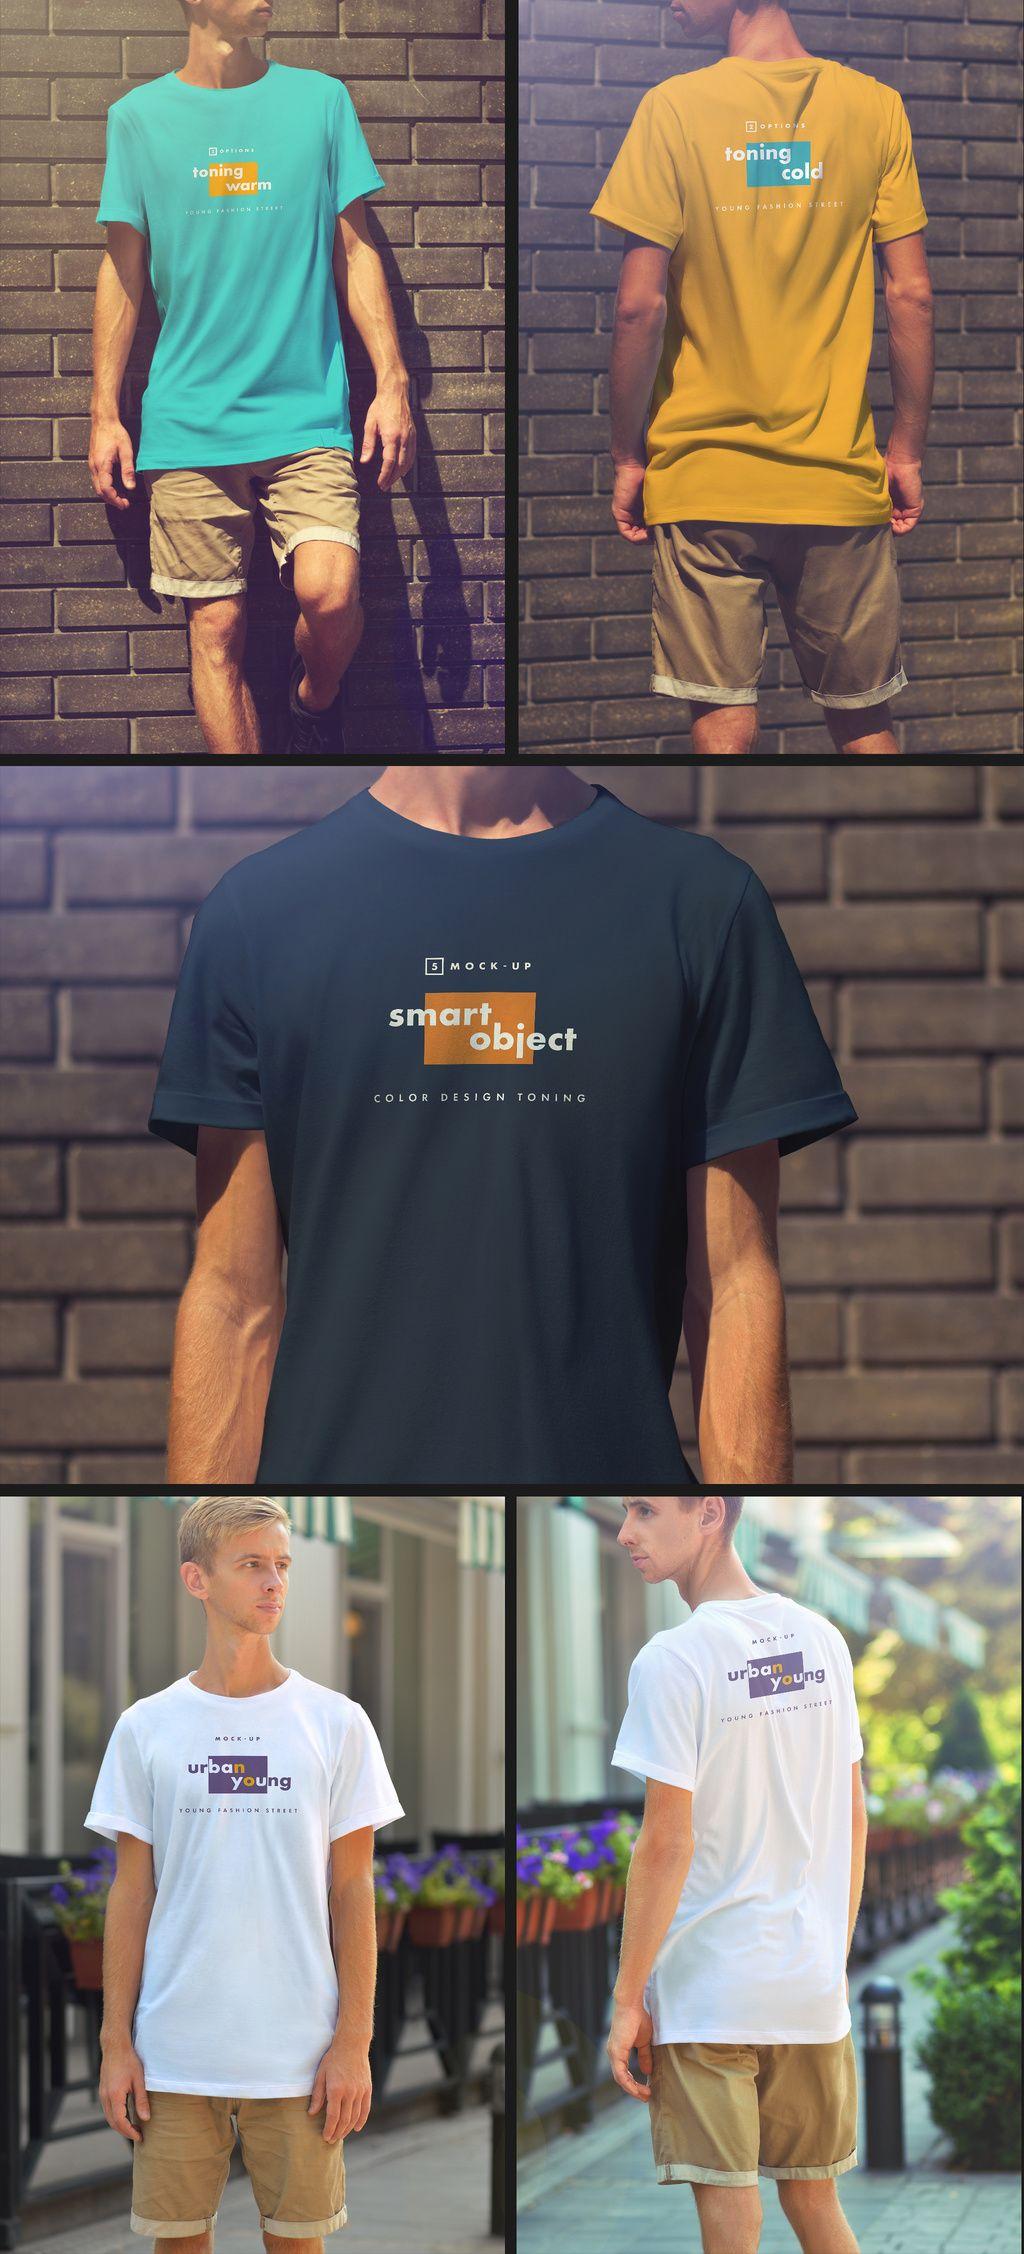 Download 5 T Shirt Mockups Pridbajte Cej Stokovij Shablon I Znajdit Bilshe Shozhih Shabloniv Na Adobe Stock Adobe Stock Shirt Mockup Mens Tops Shirts